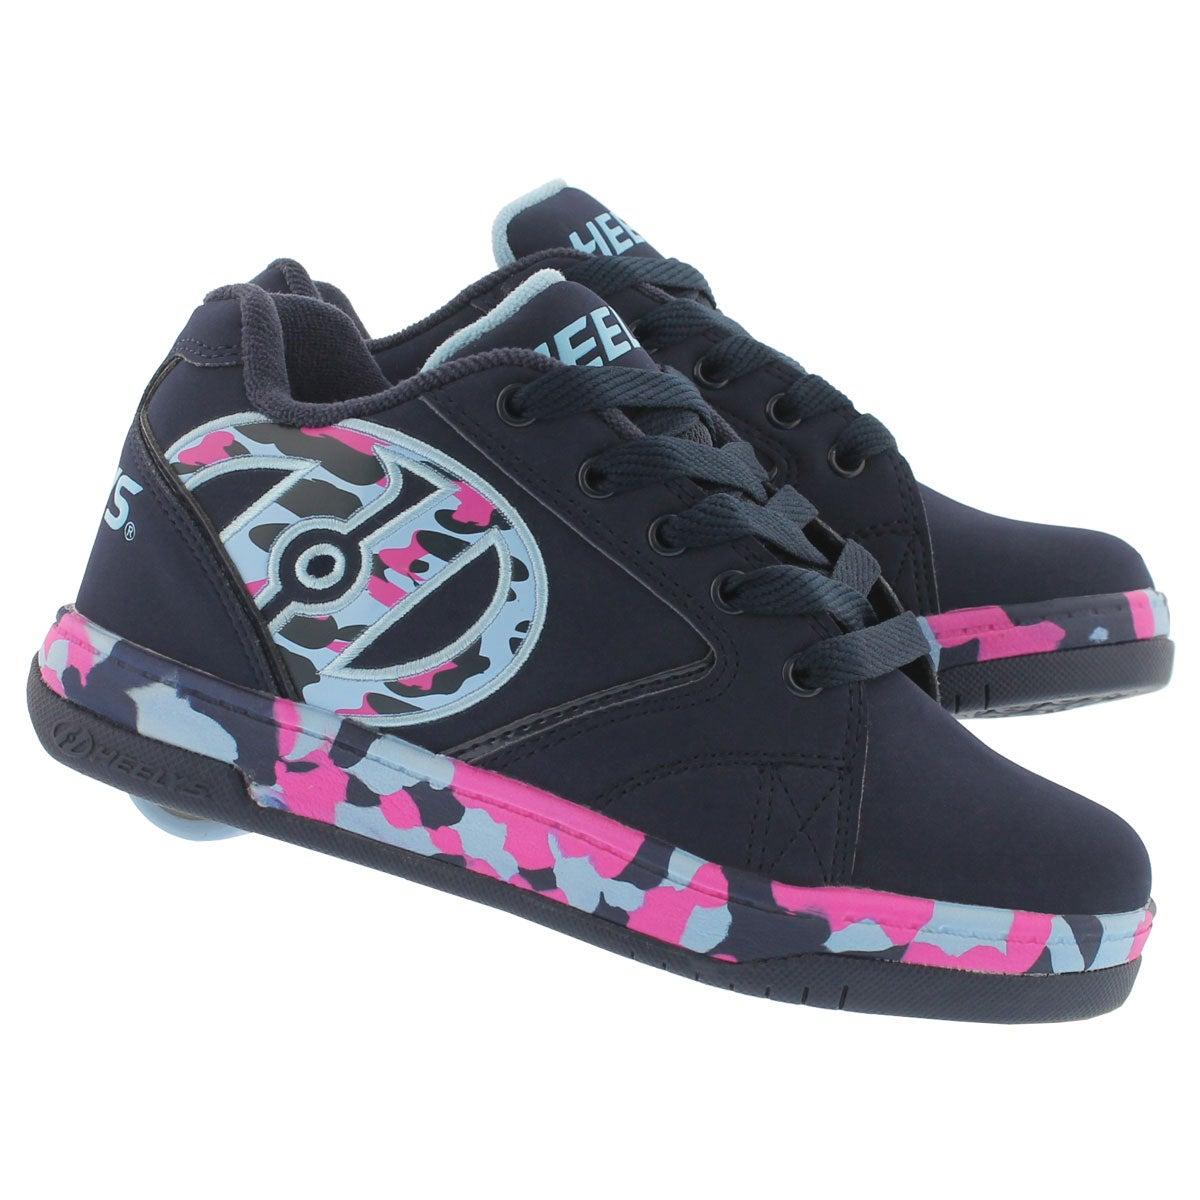 Grls Propel 2.0 nvy/pk/blu skate sneaker